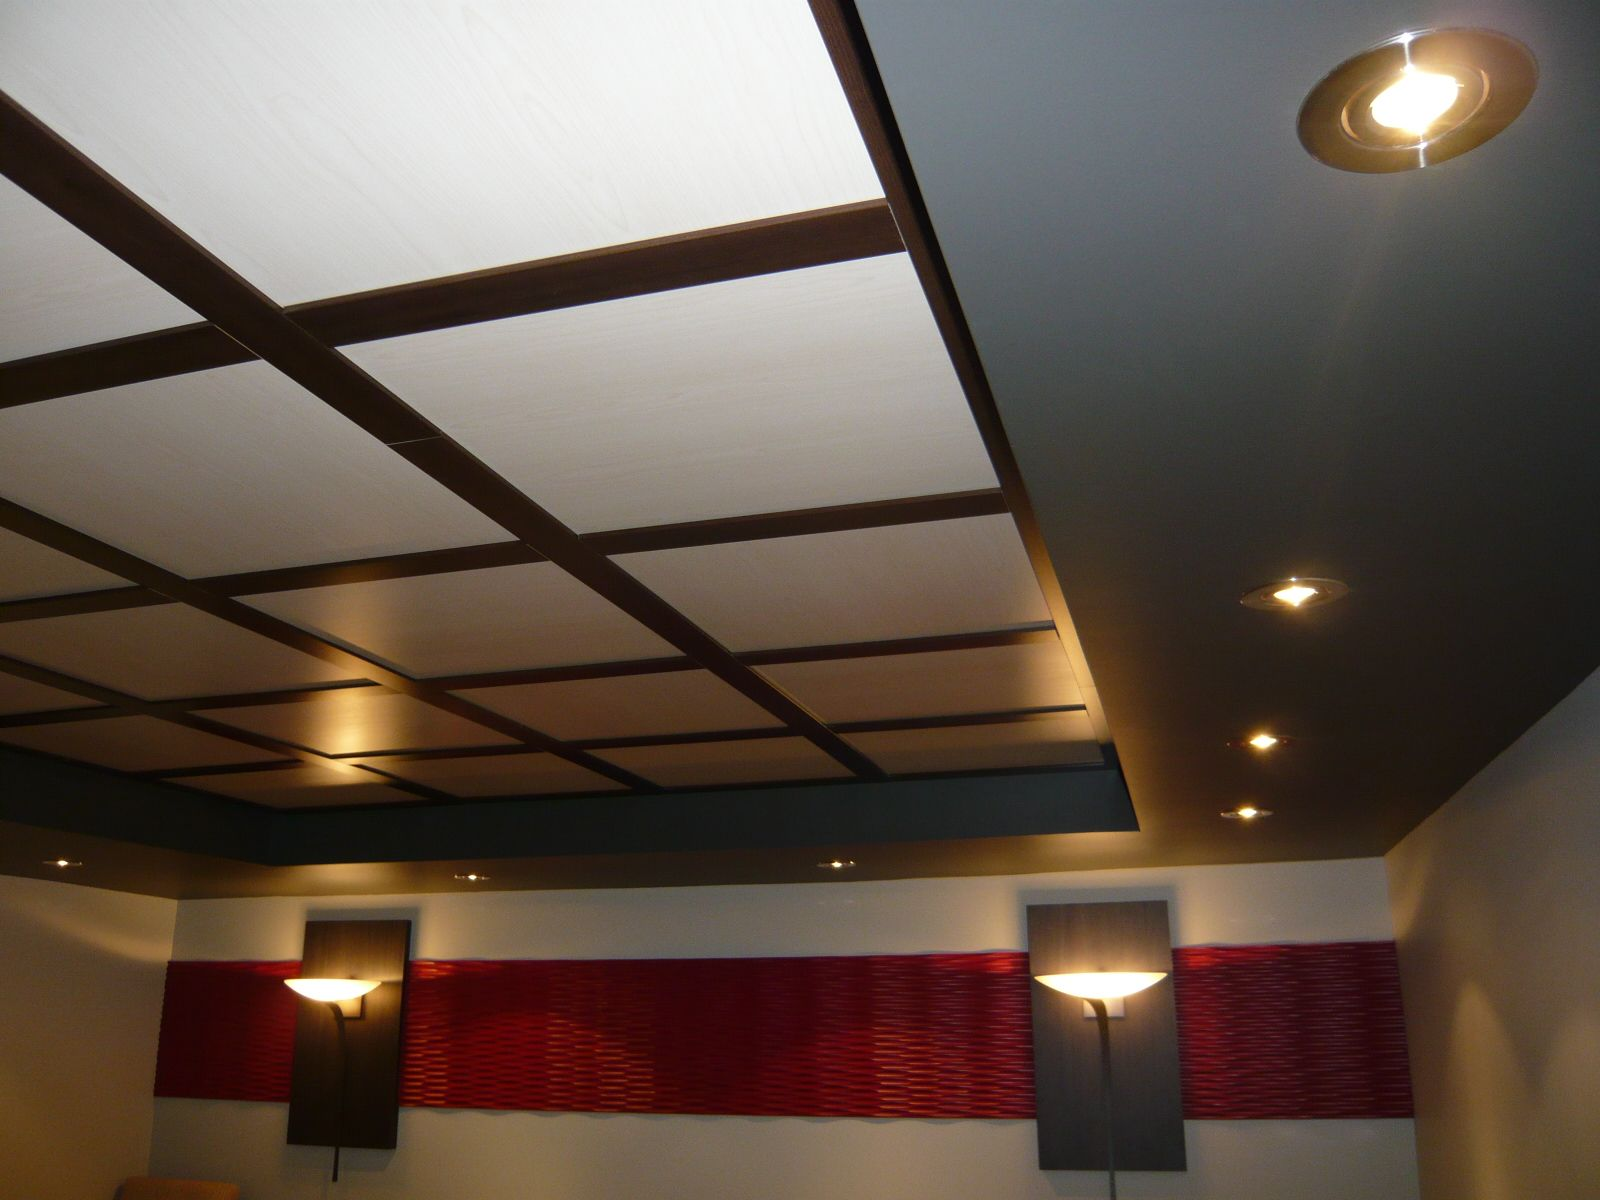 Plafond Suspendu Embassy  Rable Et Caf #Plafond Embassy Suspended